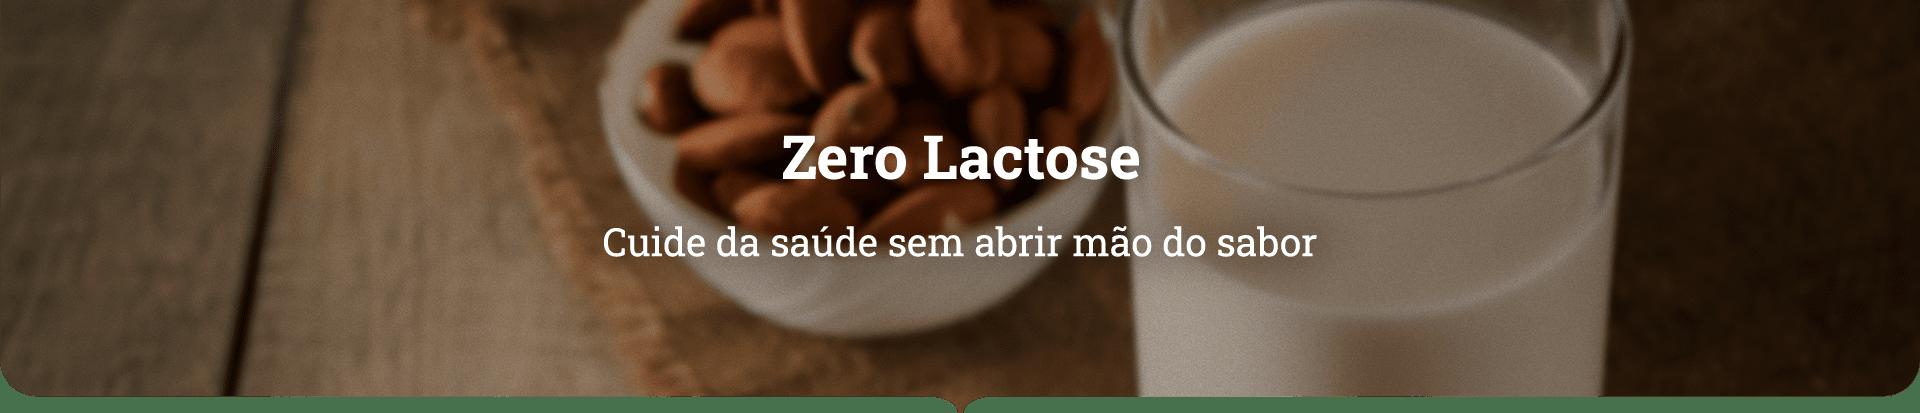 zero-lactose